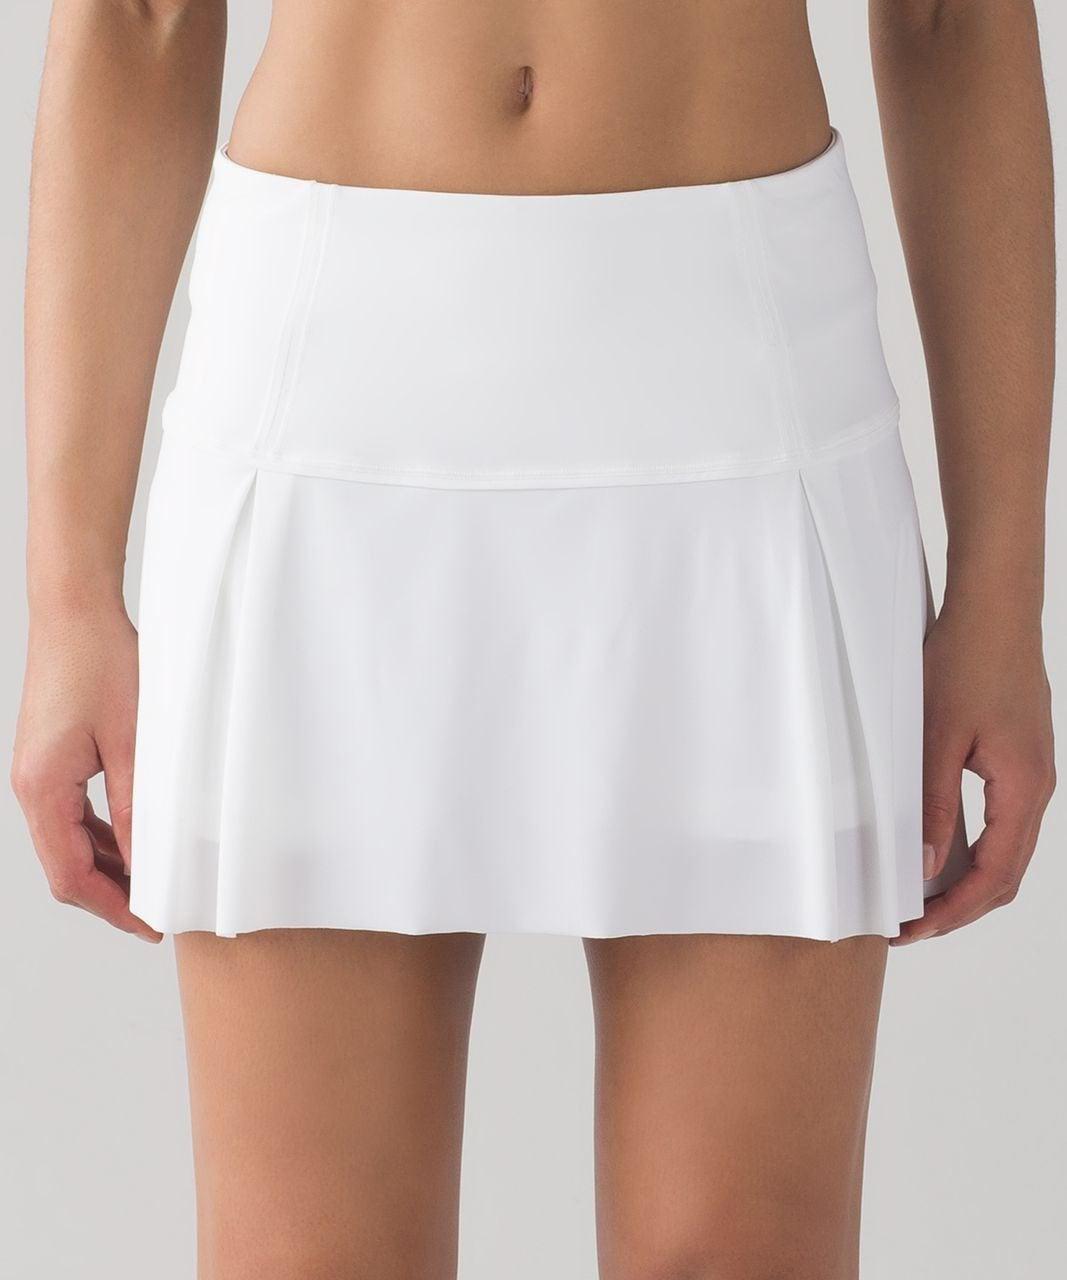 Lululemon Lost In Pace Skirt White